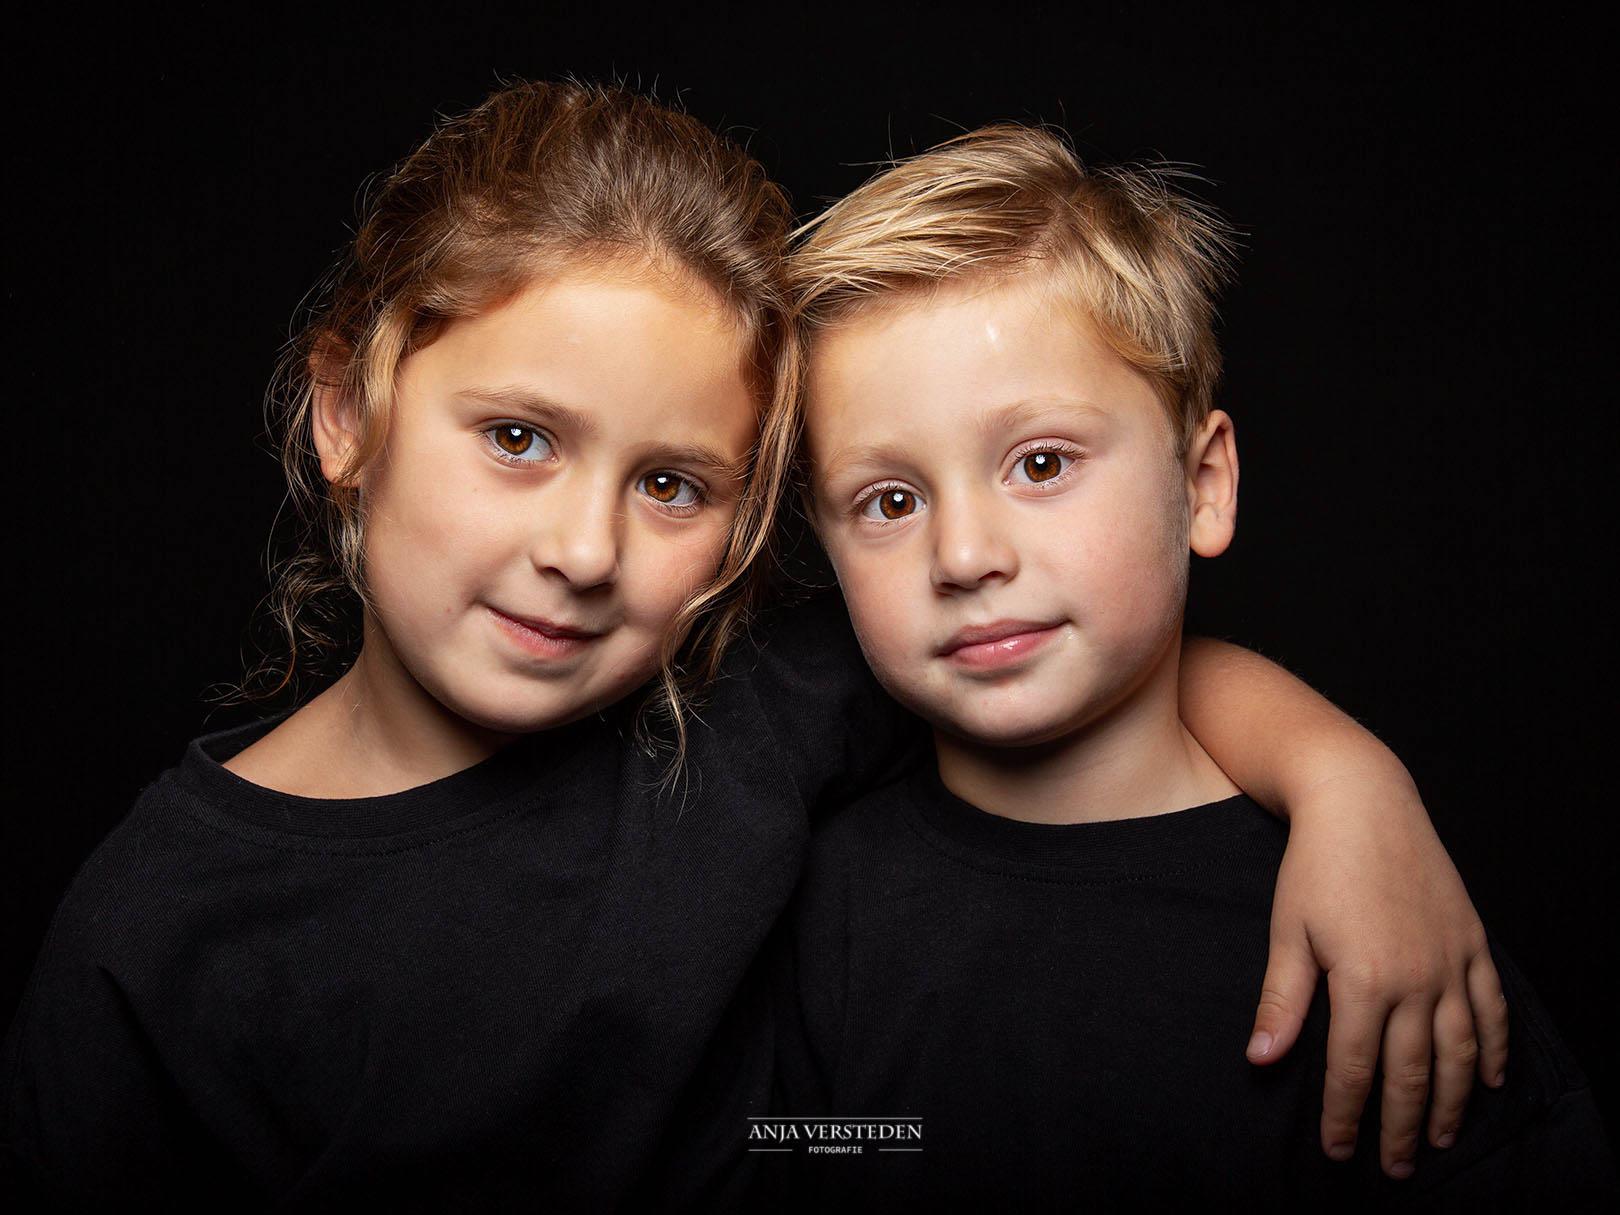 Tijdloos kinderportret